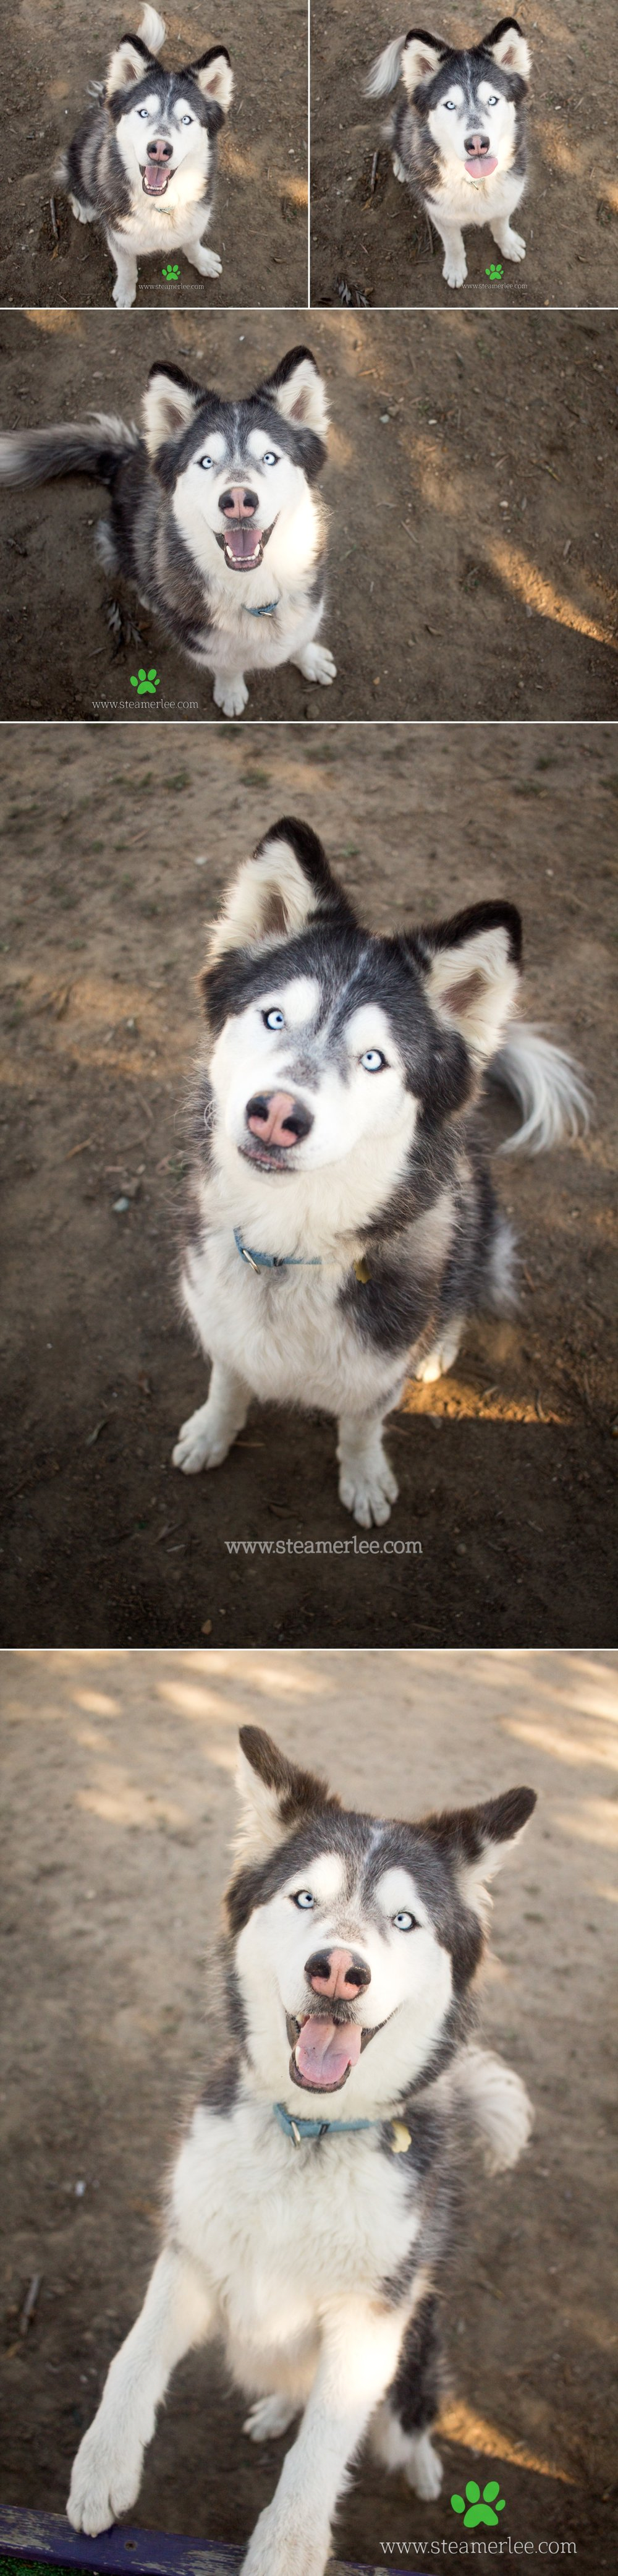 04 Steamer Lee Dog Photography - Seal Beach Animal Care Center.JPG